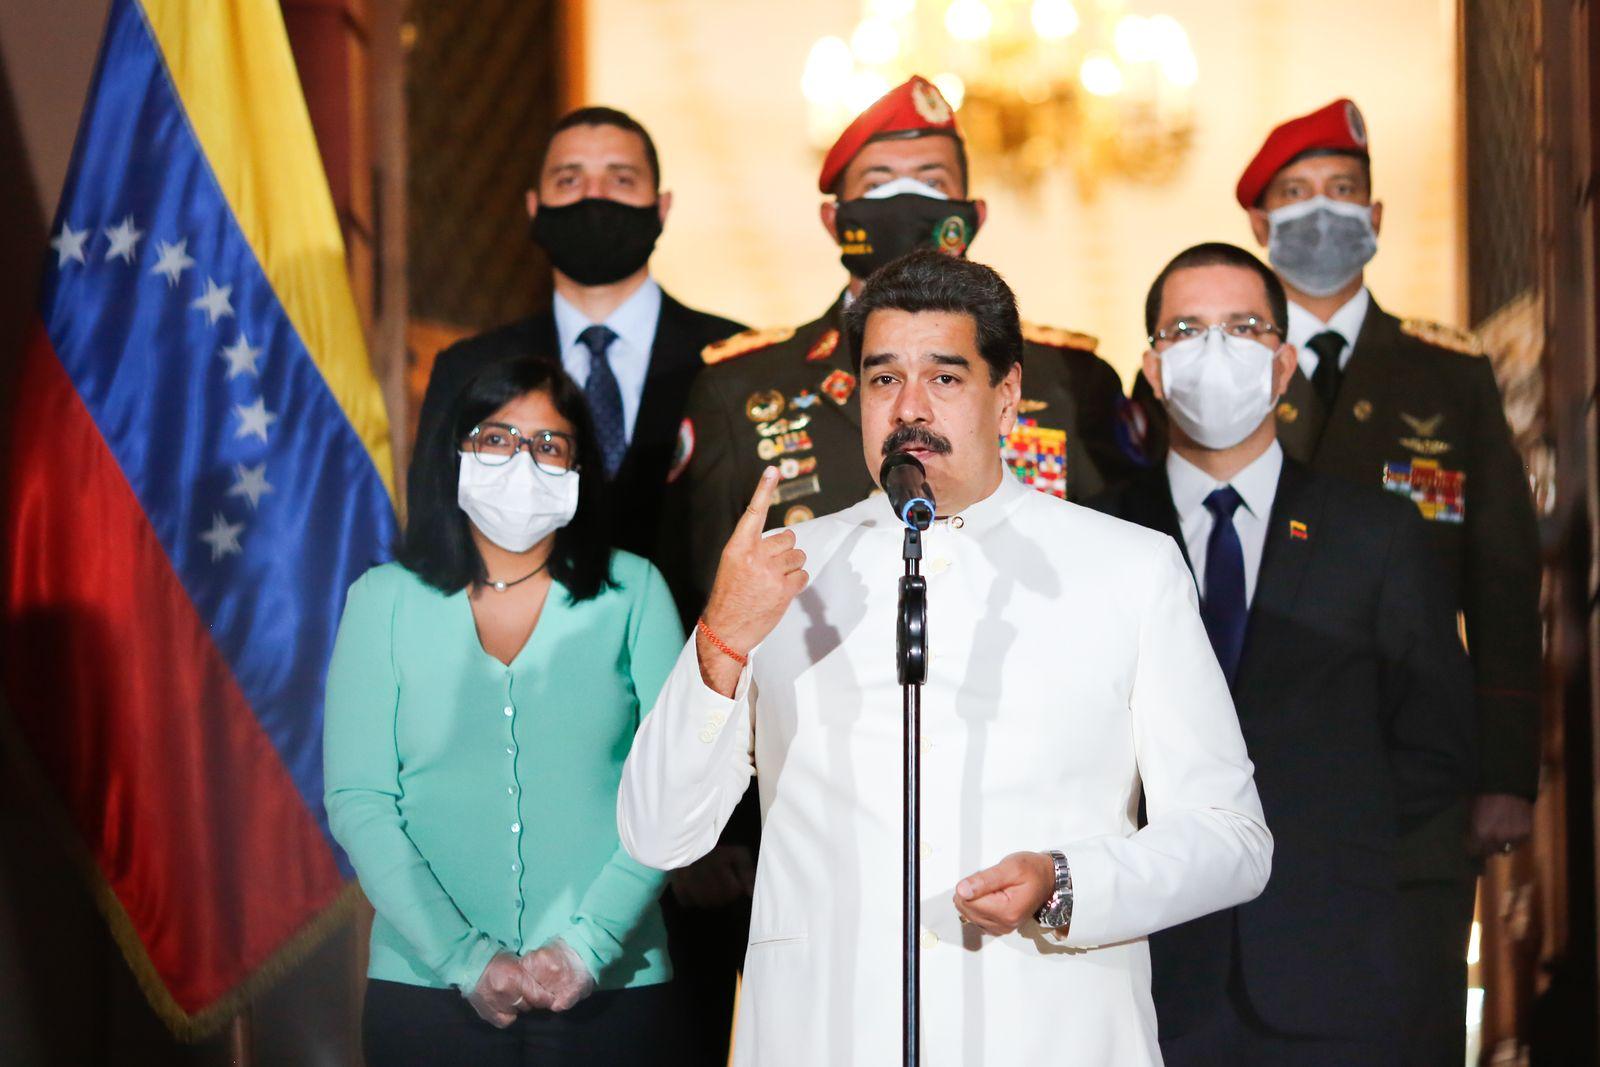 VENEZUELA-POLITICS-MADURO-OIL